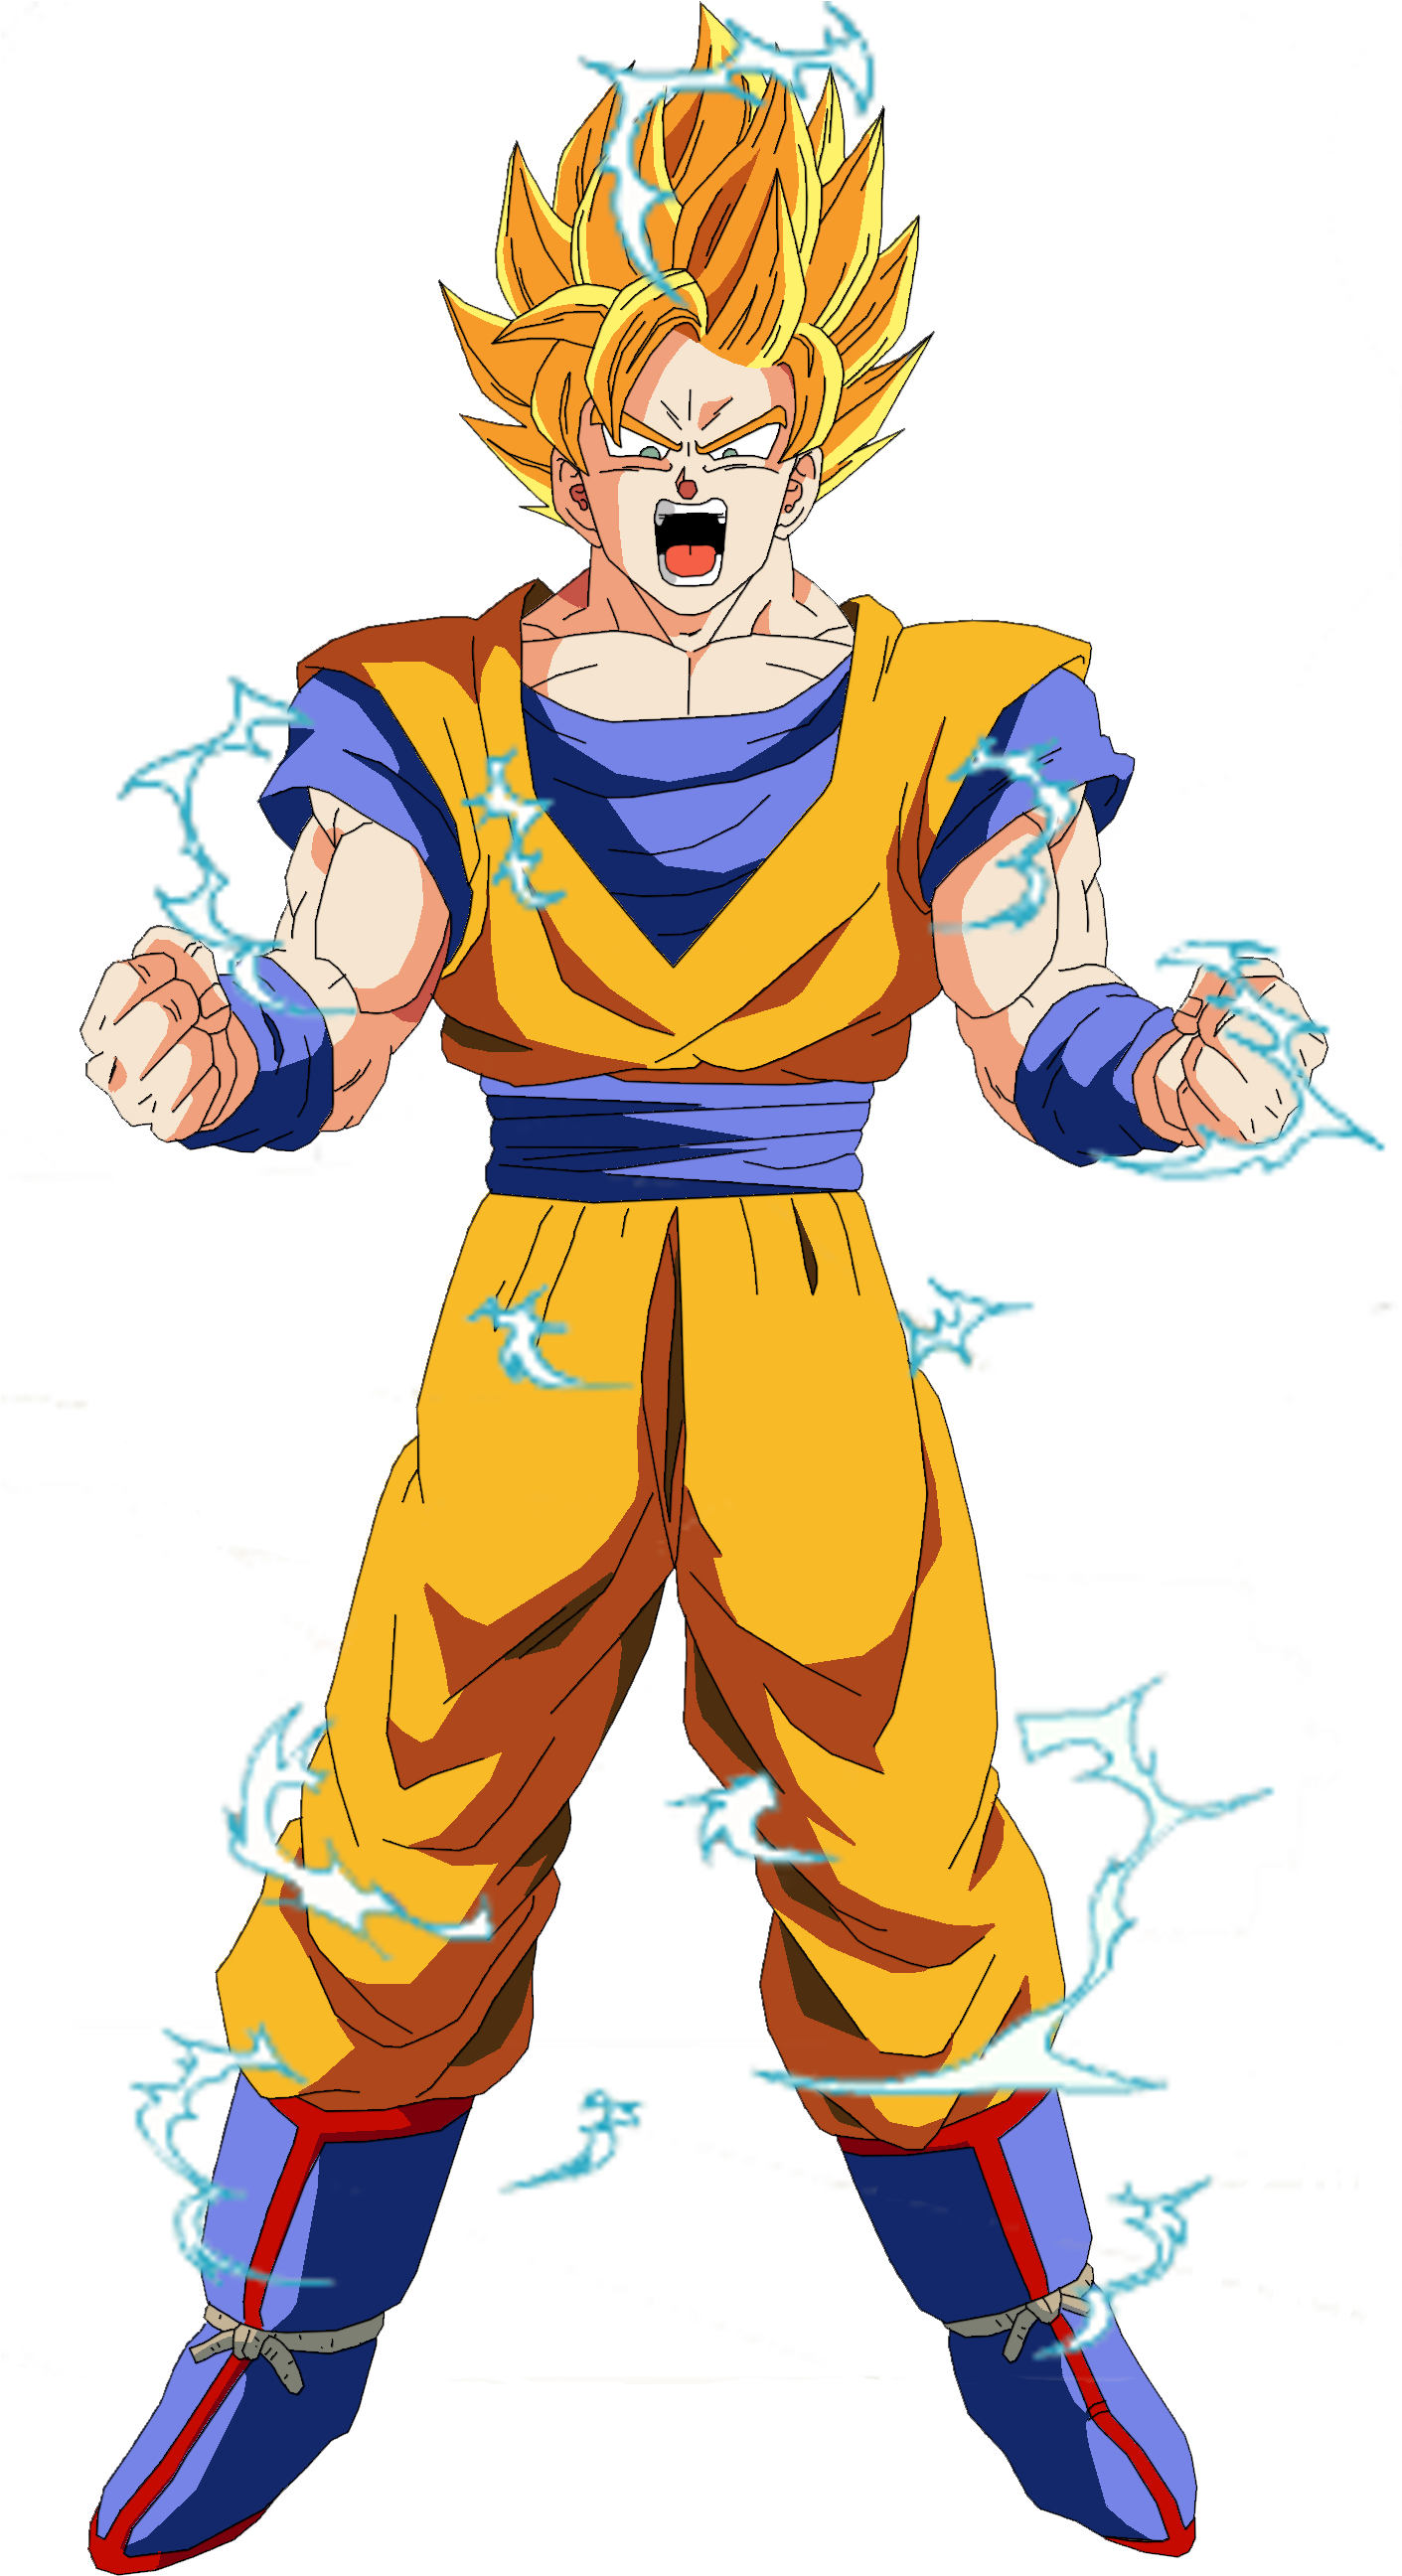 Goku Super Saiyan Live Dbz Goku Super Saiyan 2